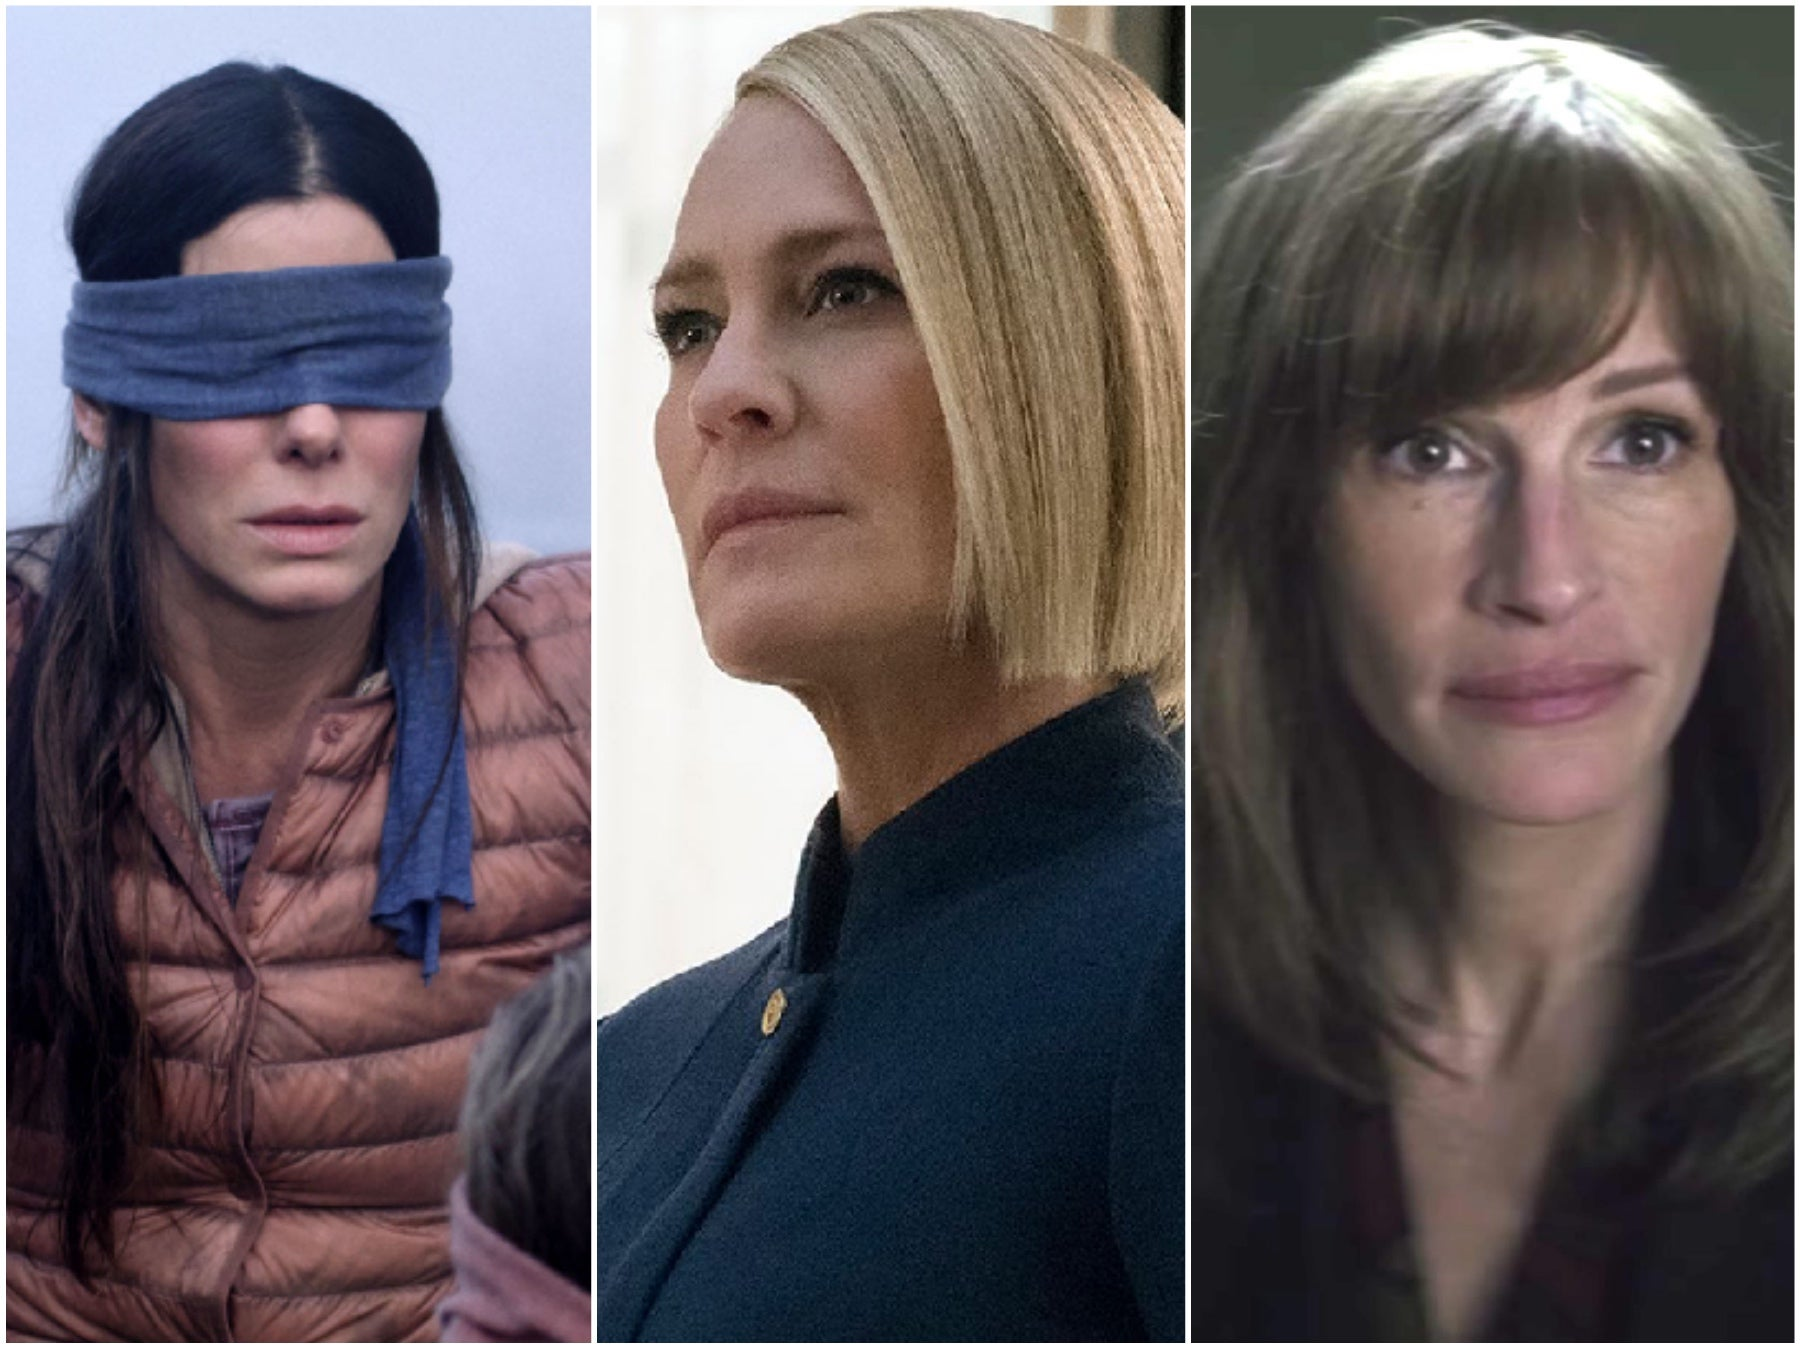 Sabdra Bullock, Robin Wright and Julia Roberts